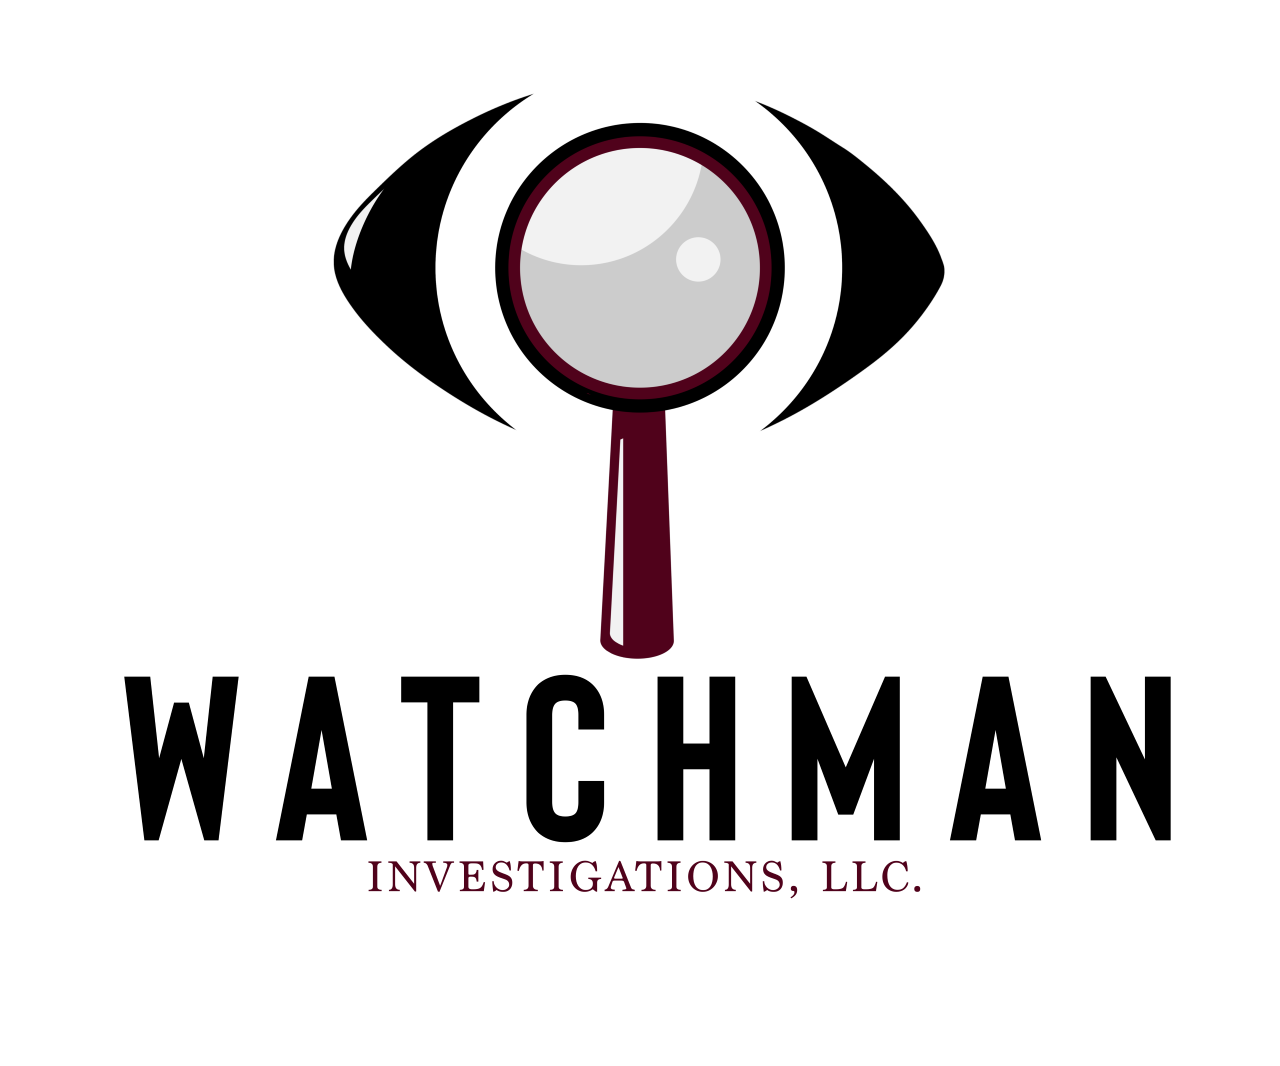 Watchman Investigations, LLC